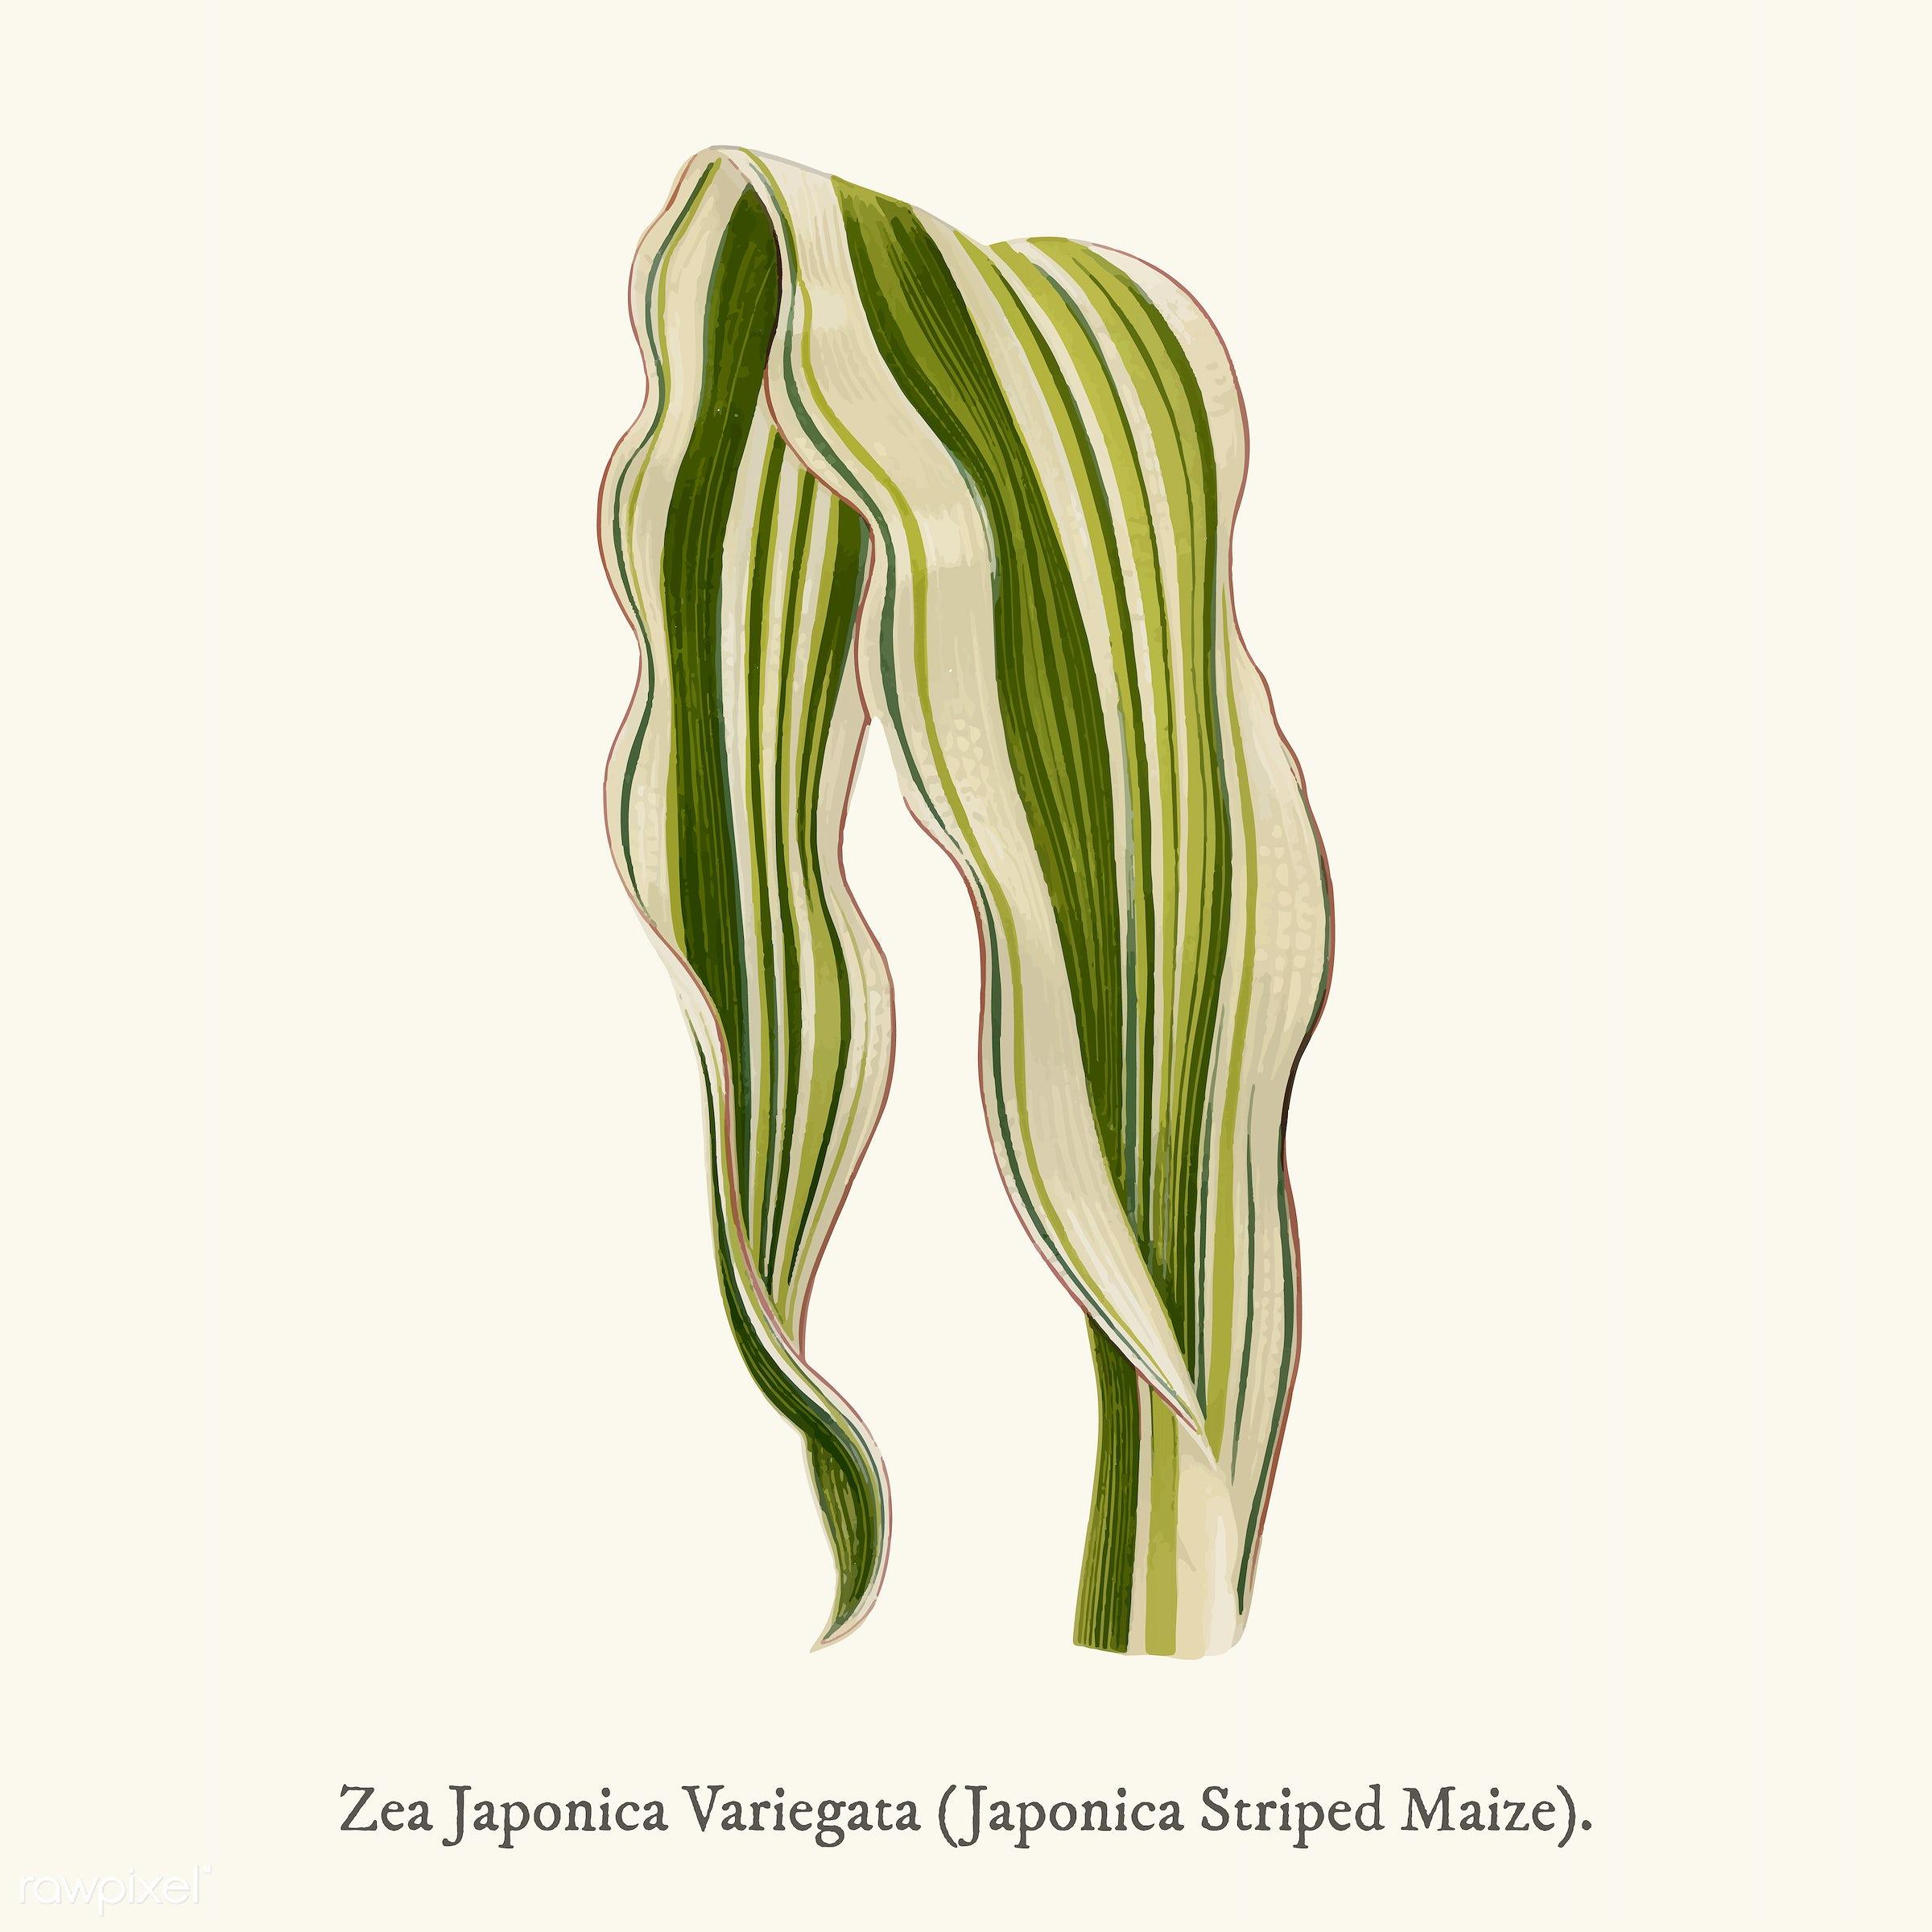 ancient, antique, decorate, decoration, design, drawing, graphic, illustration, japonica, leaf, leaves, nature, pattern,...